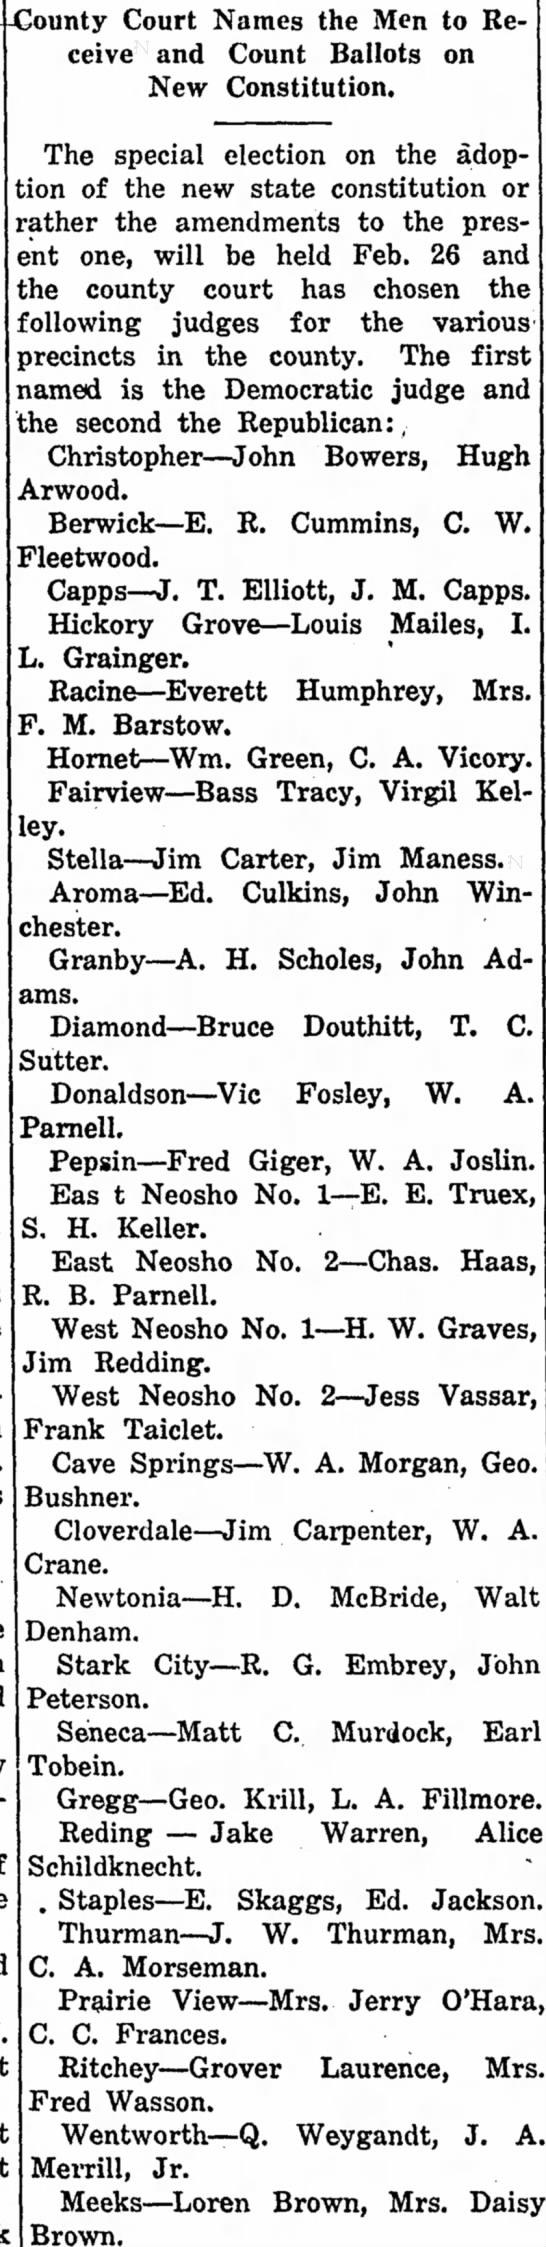 Bruce Douthitt Jan 24, 1924The Neosho Times -